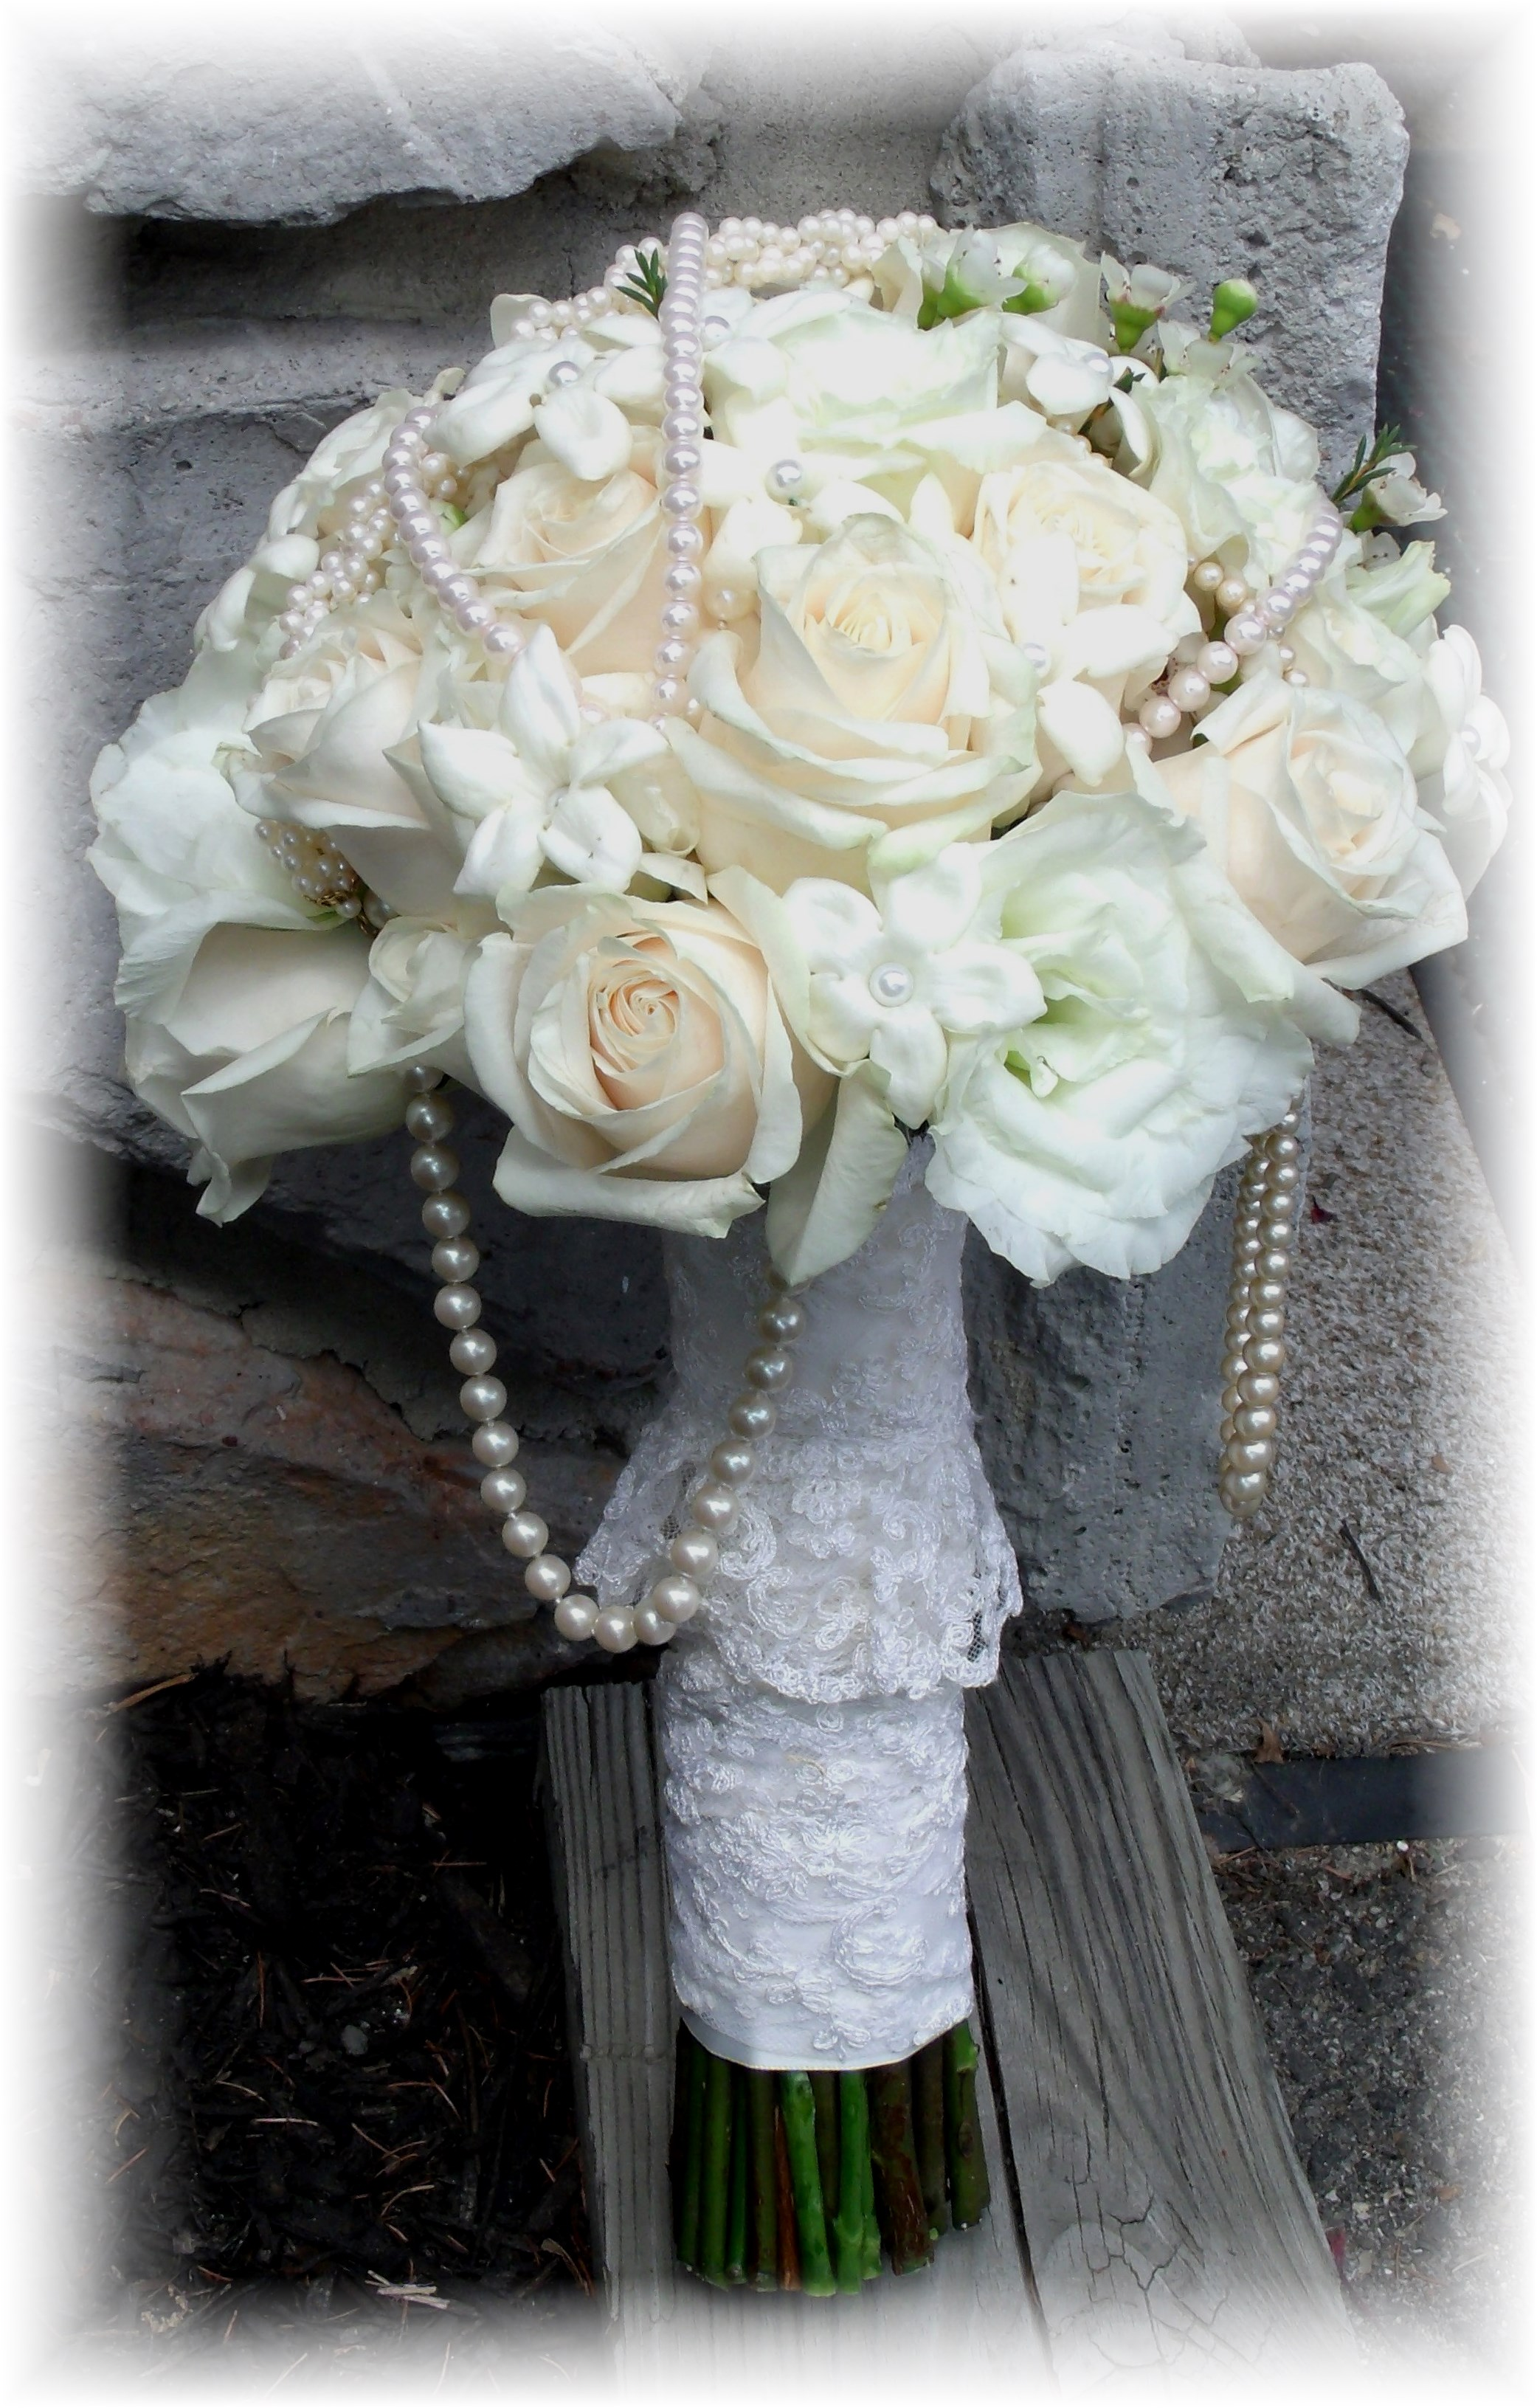 Roses, stephanotis & Pearls